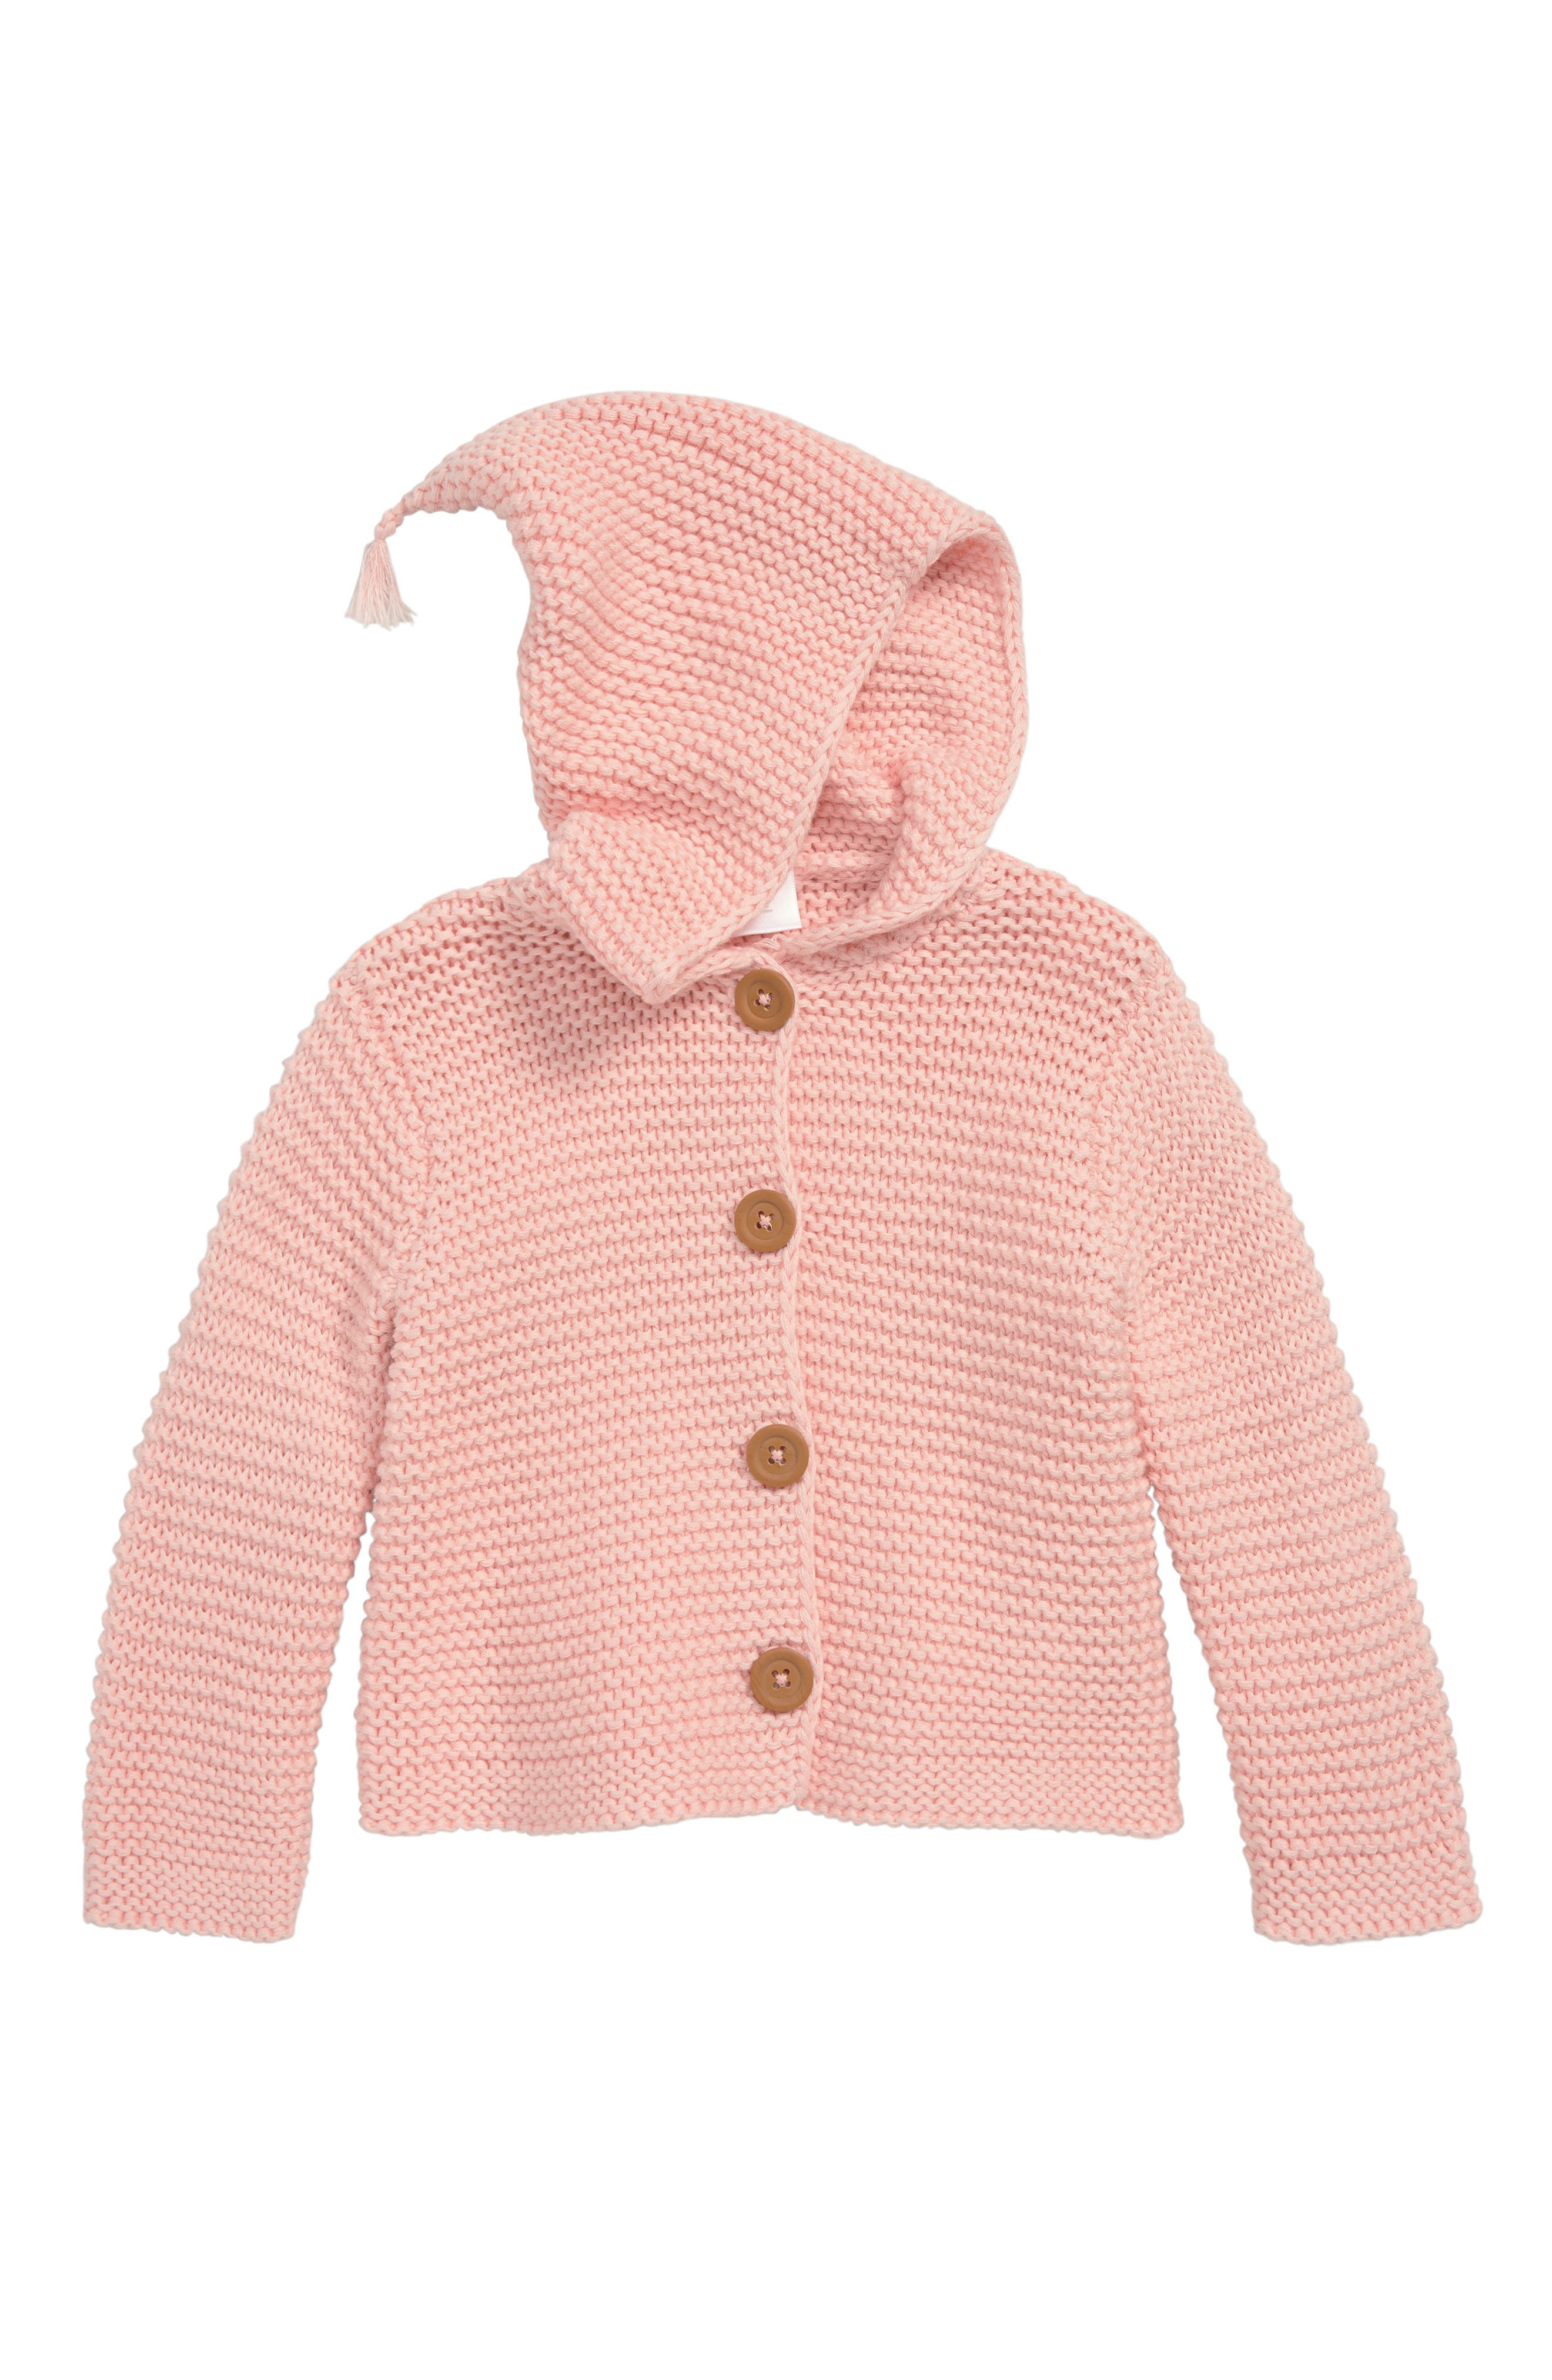 NORDSTROM BABY,                             Lofty Organic Cotton Hooded Cardigan,                             Main thumbnail 1, color,                             PINK SEASHELL